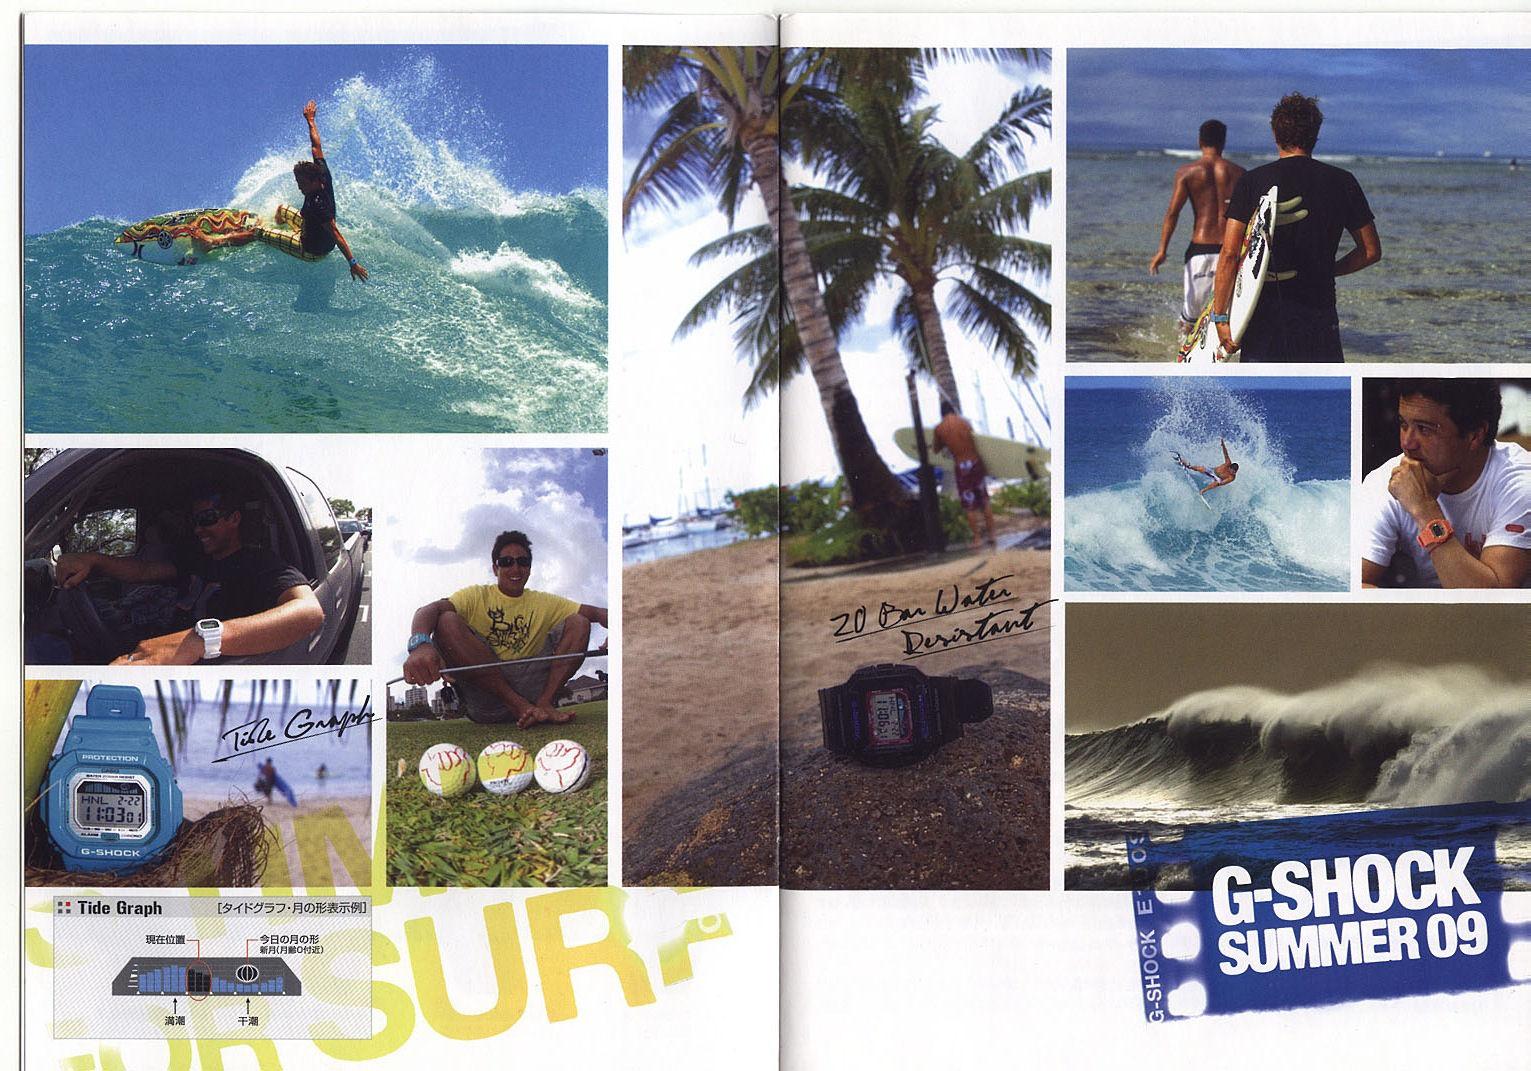 Casio-G-Shock-Surf-Collection-Summer-2009-Page-3.jpg